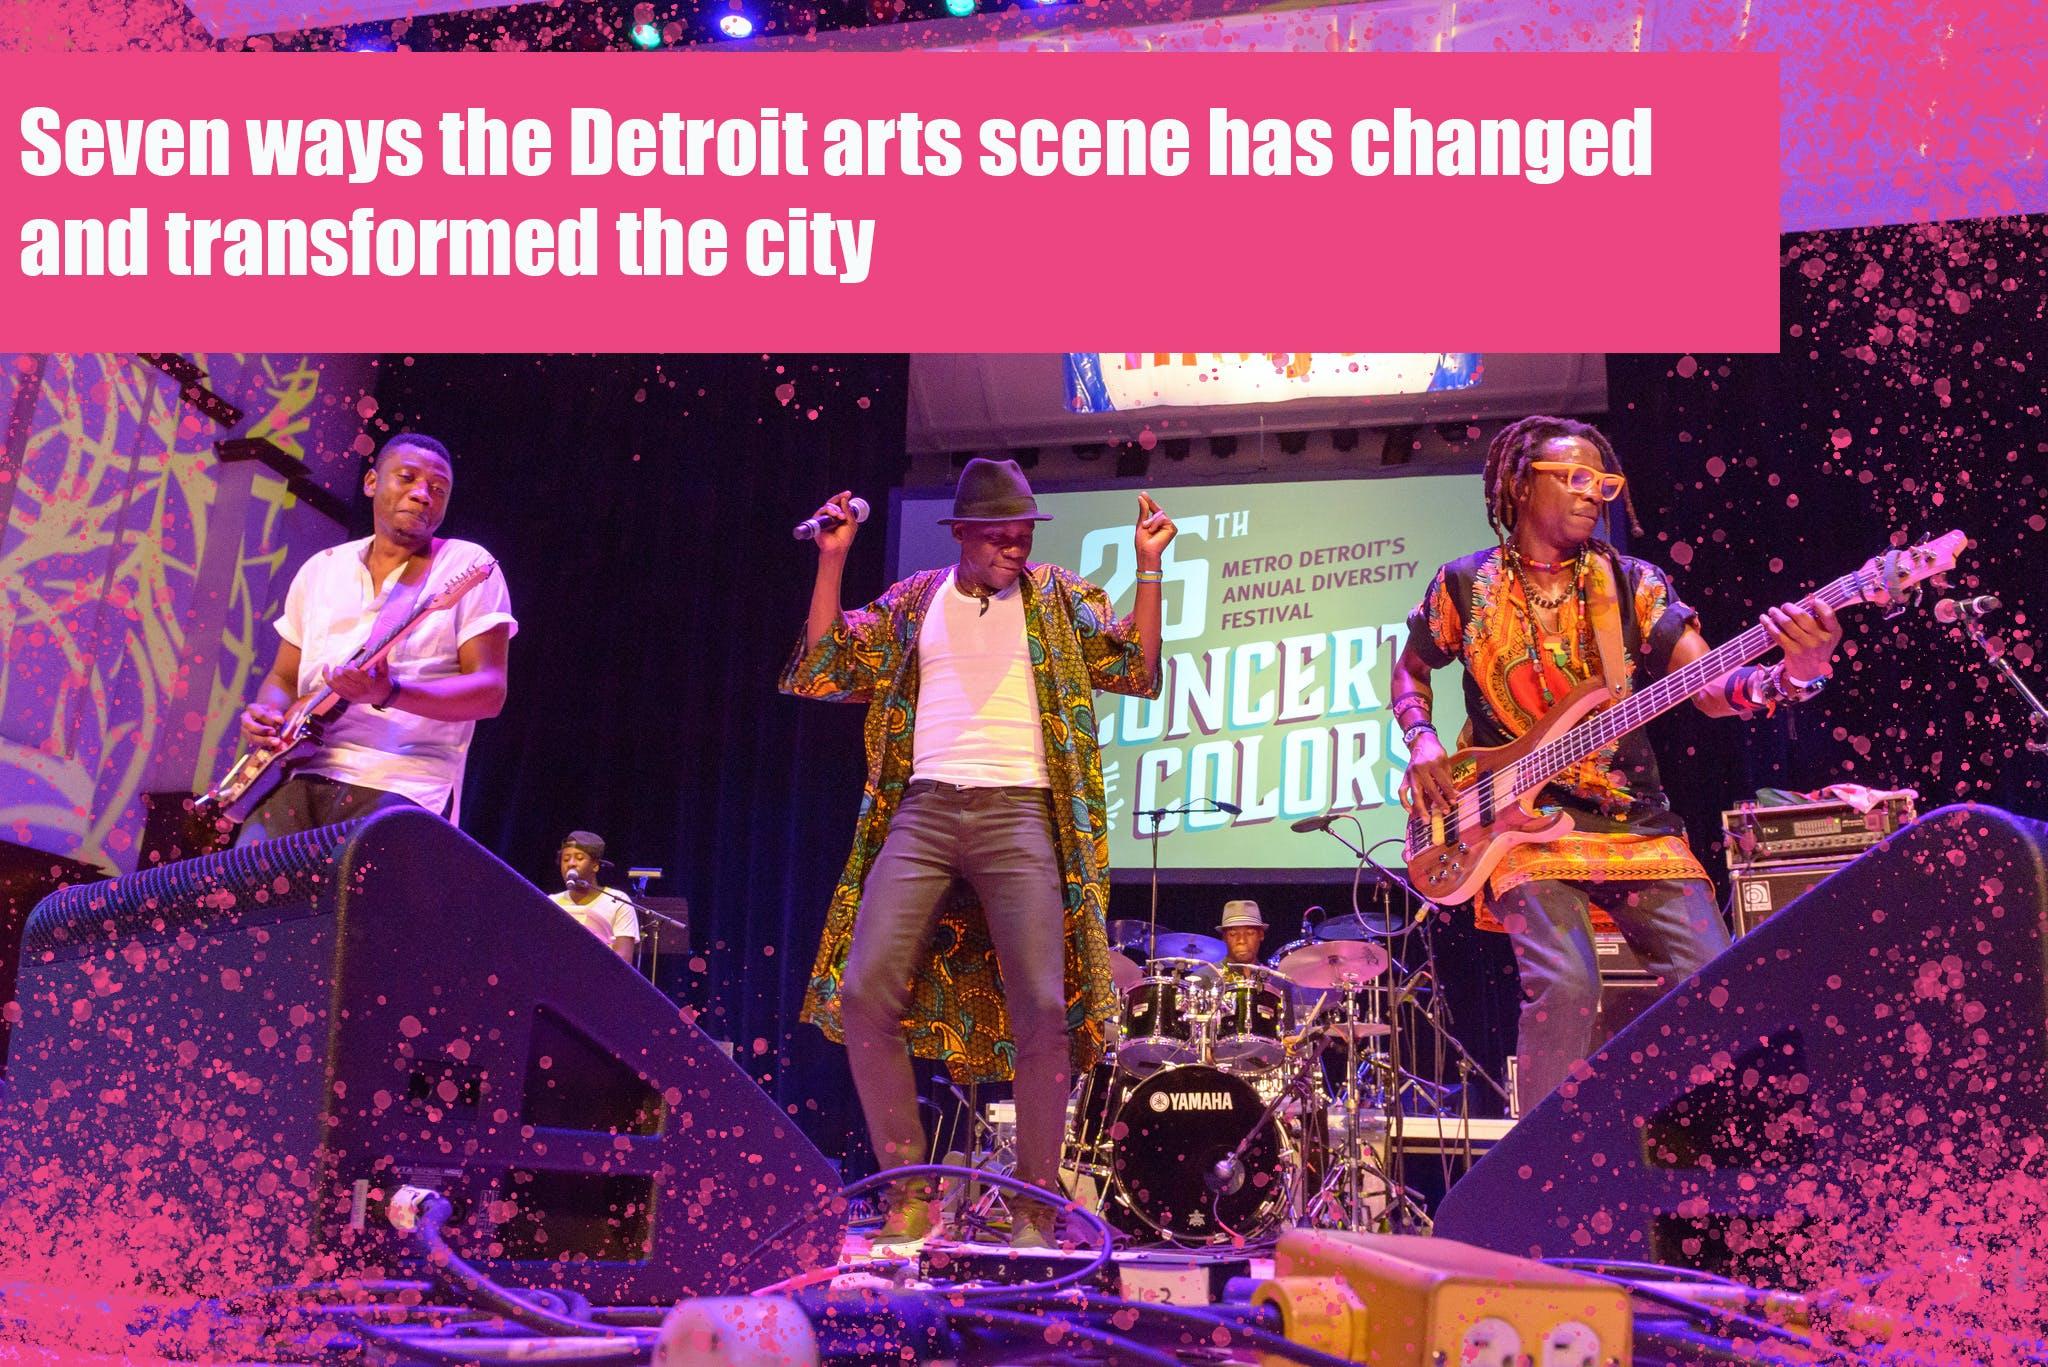 "<p><em>Read <a href=""https://kf.org/artsindetroit"" rel=""noopener noreferrer"" target=""_blank"">our blog</a> highlighting seven ways the Detroit arts ecosystem has evolved over a decade.&nbsp;</em></p>"